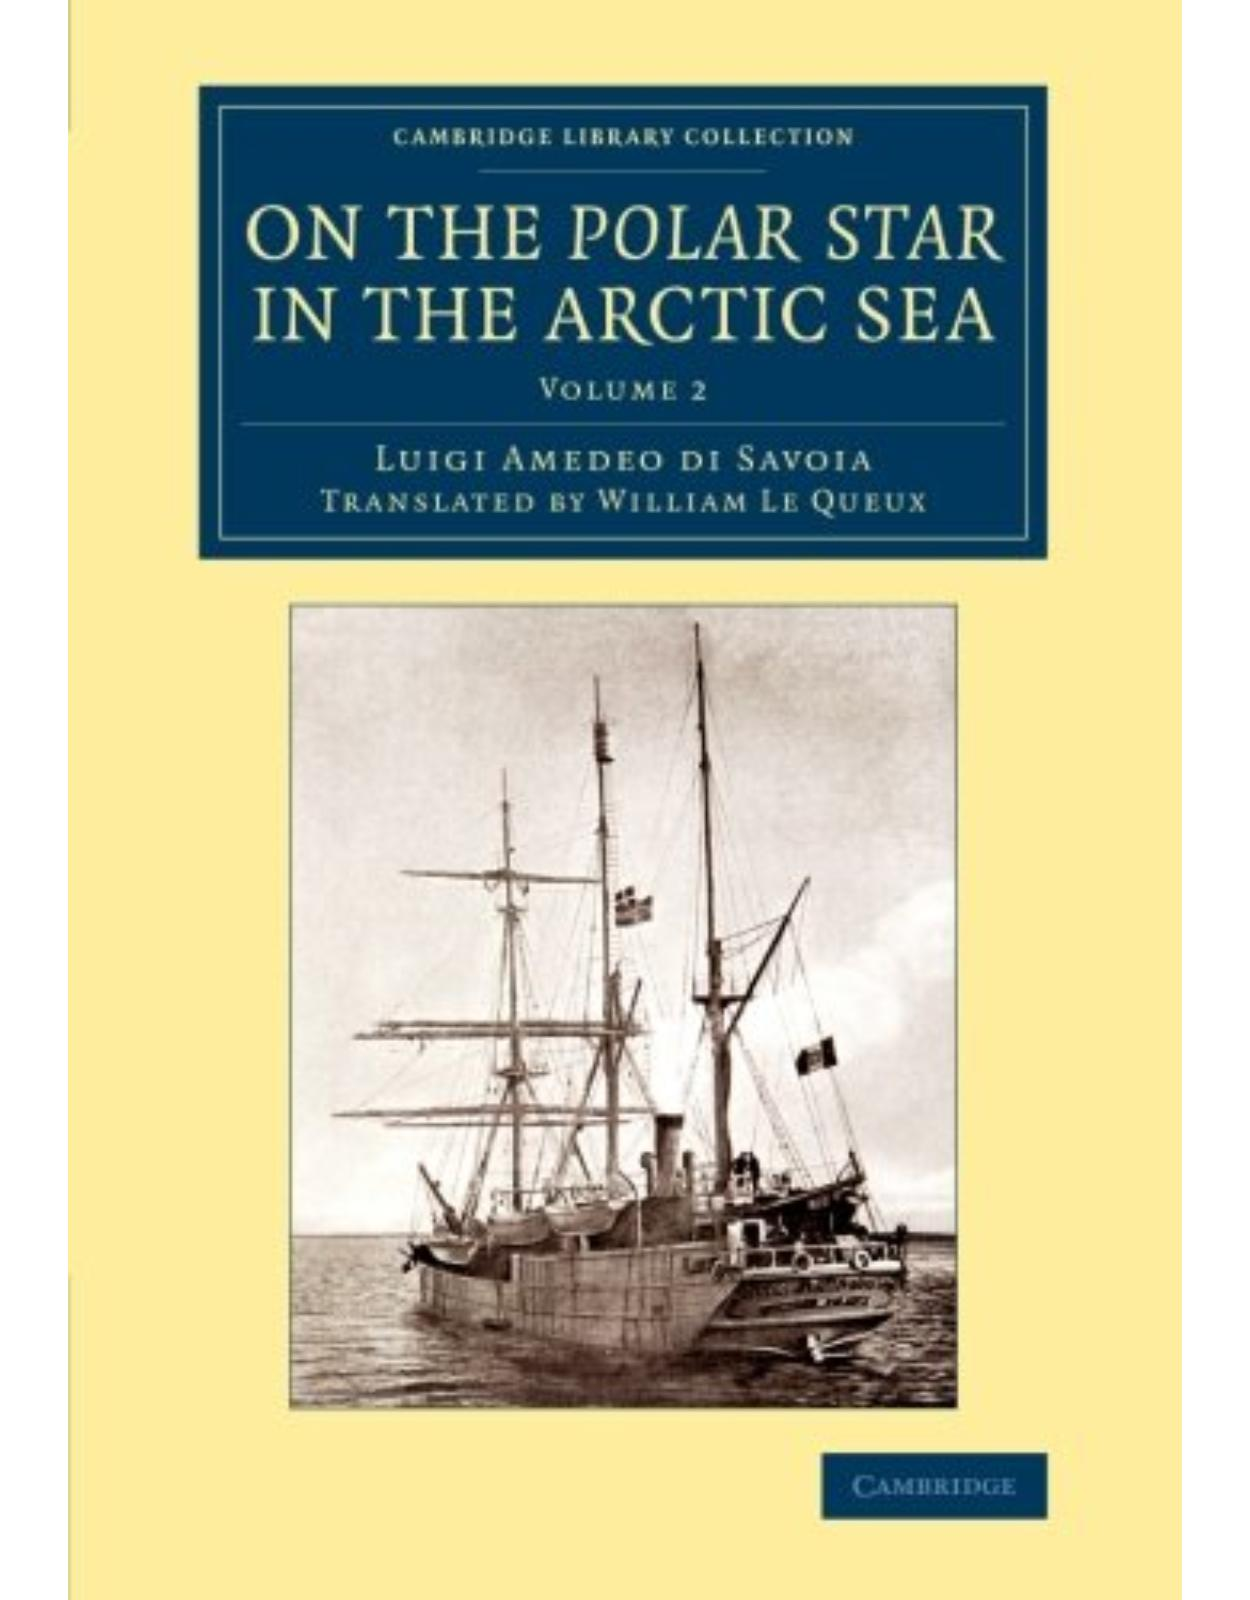 On the Polar Star in the Arctic Sea: Volume 2 (Cambridge Library Collection - Polar Exploration)